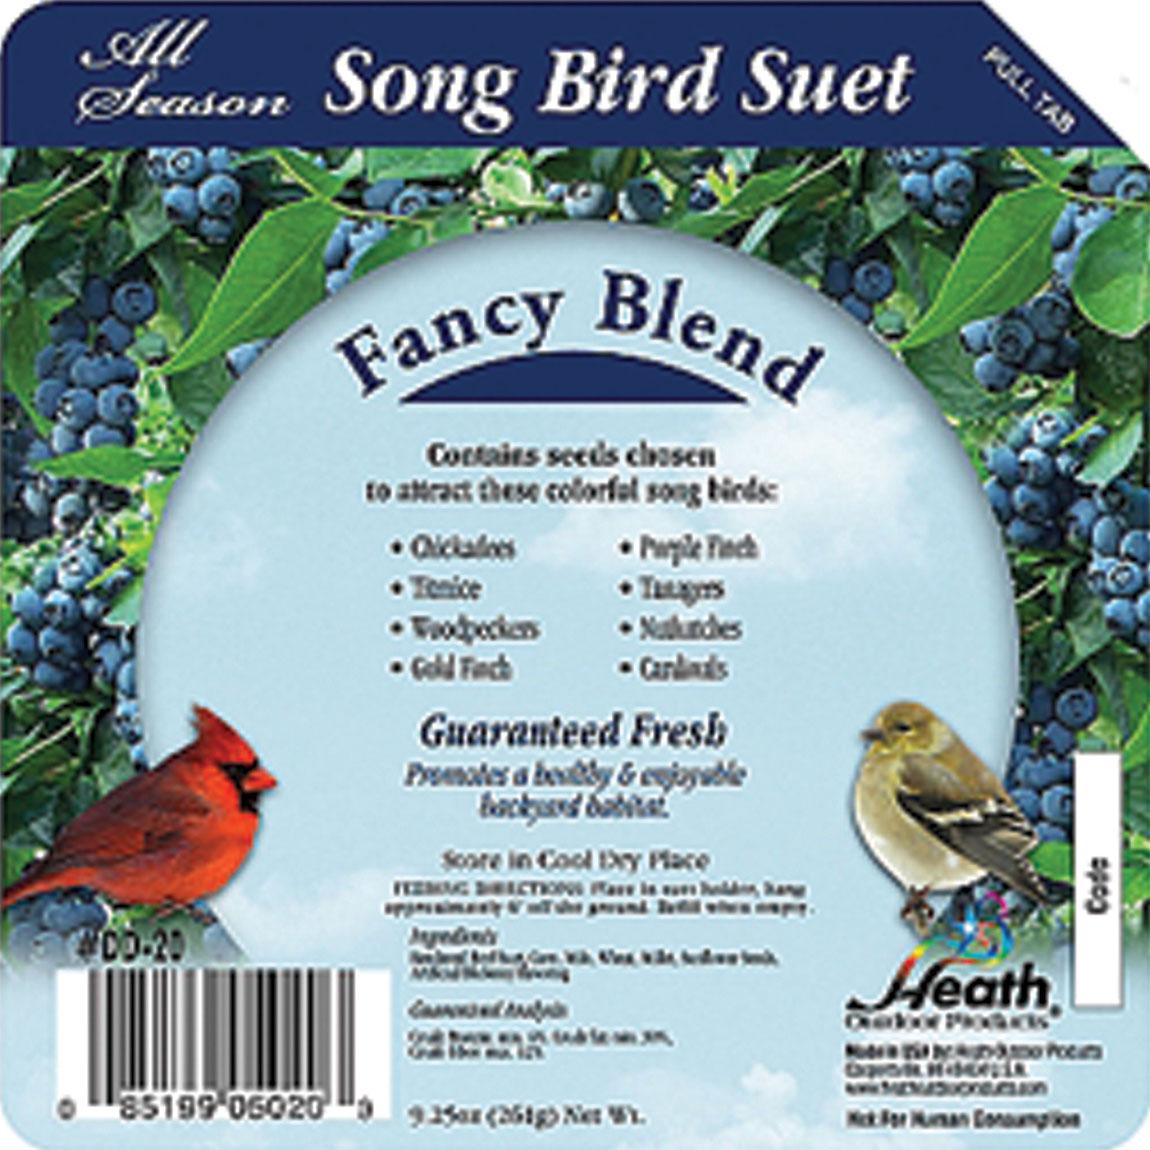 Heath Mfg Co P-Song Bird Suet Cake- Fancy Blend 9.25 Ounce (Case of 16 )